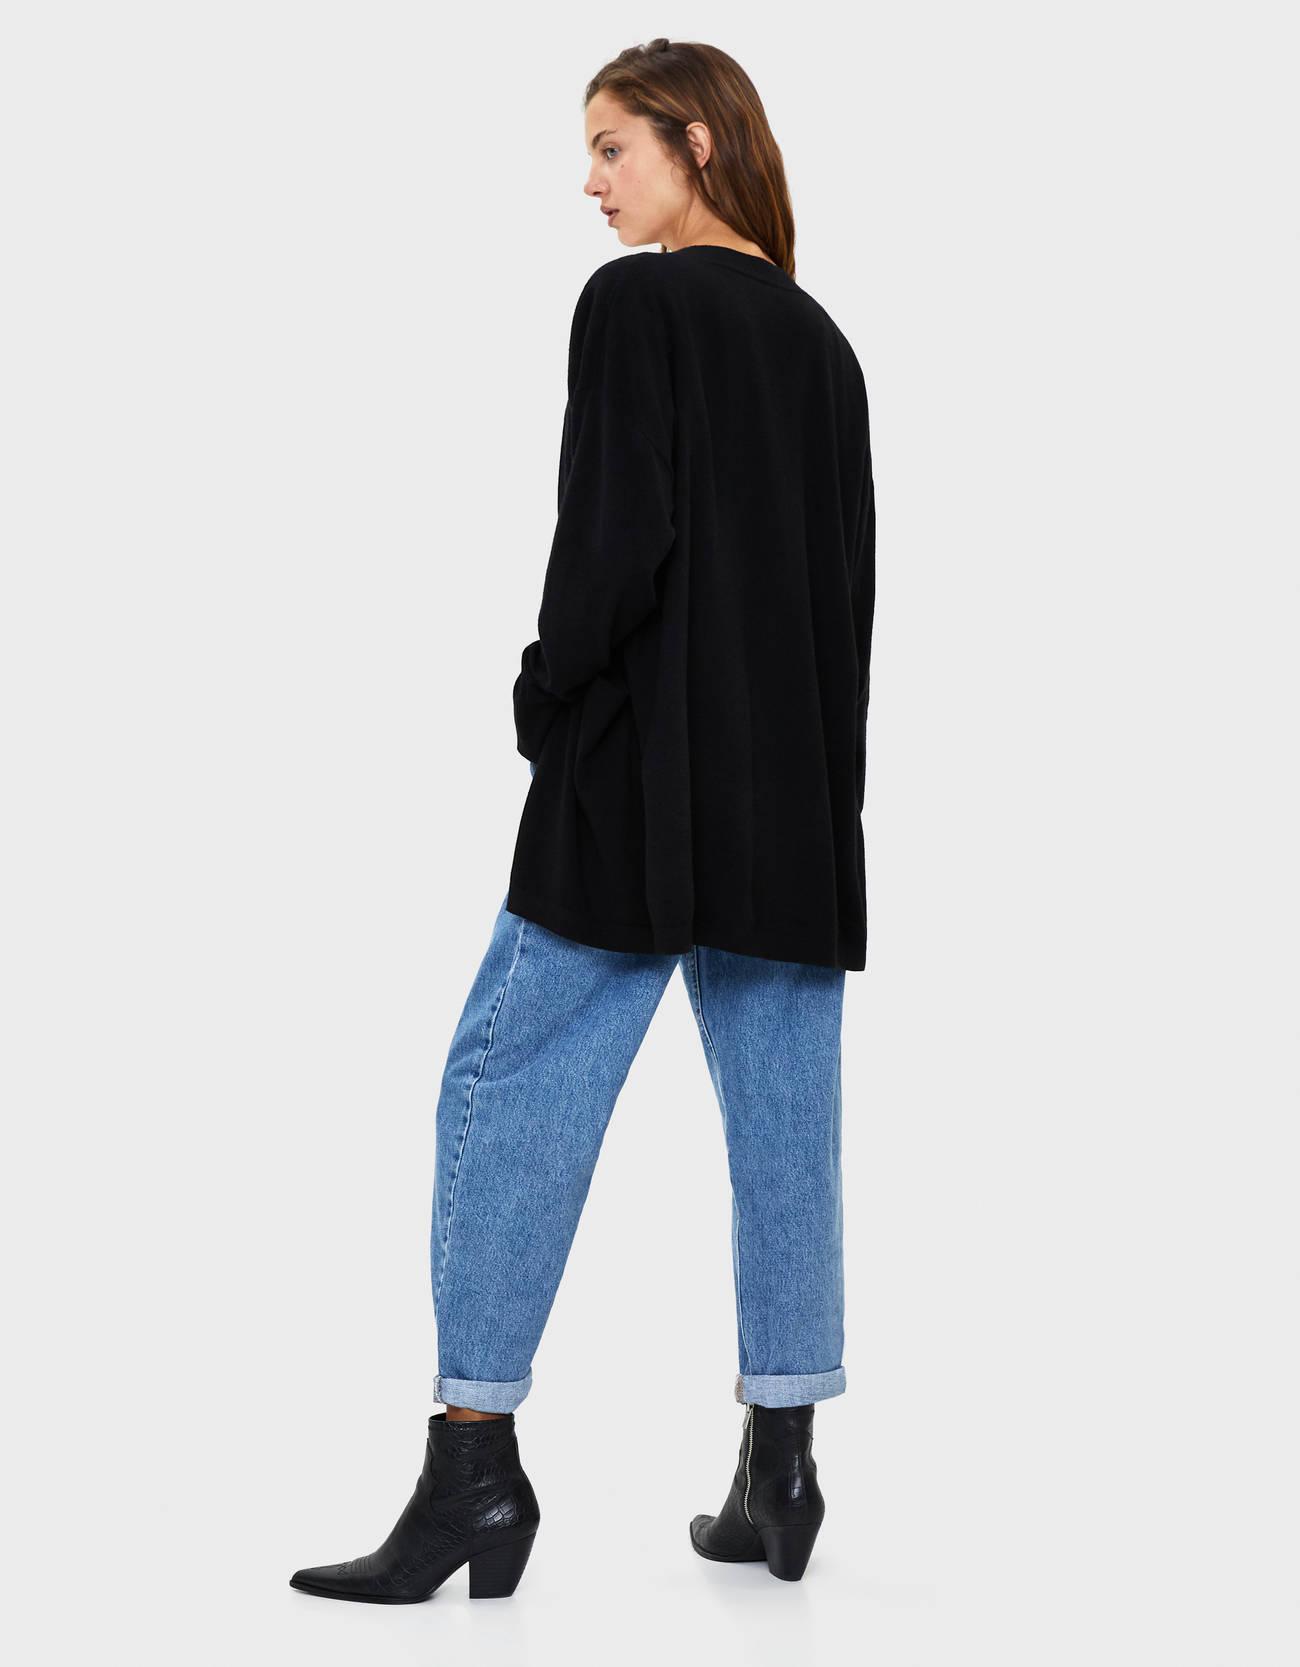 Длинный кардиган с карманами Черный Bershka